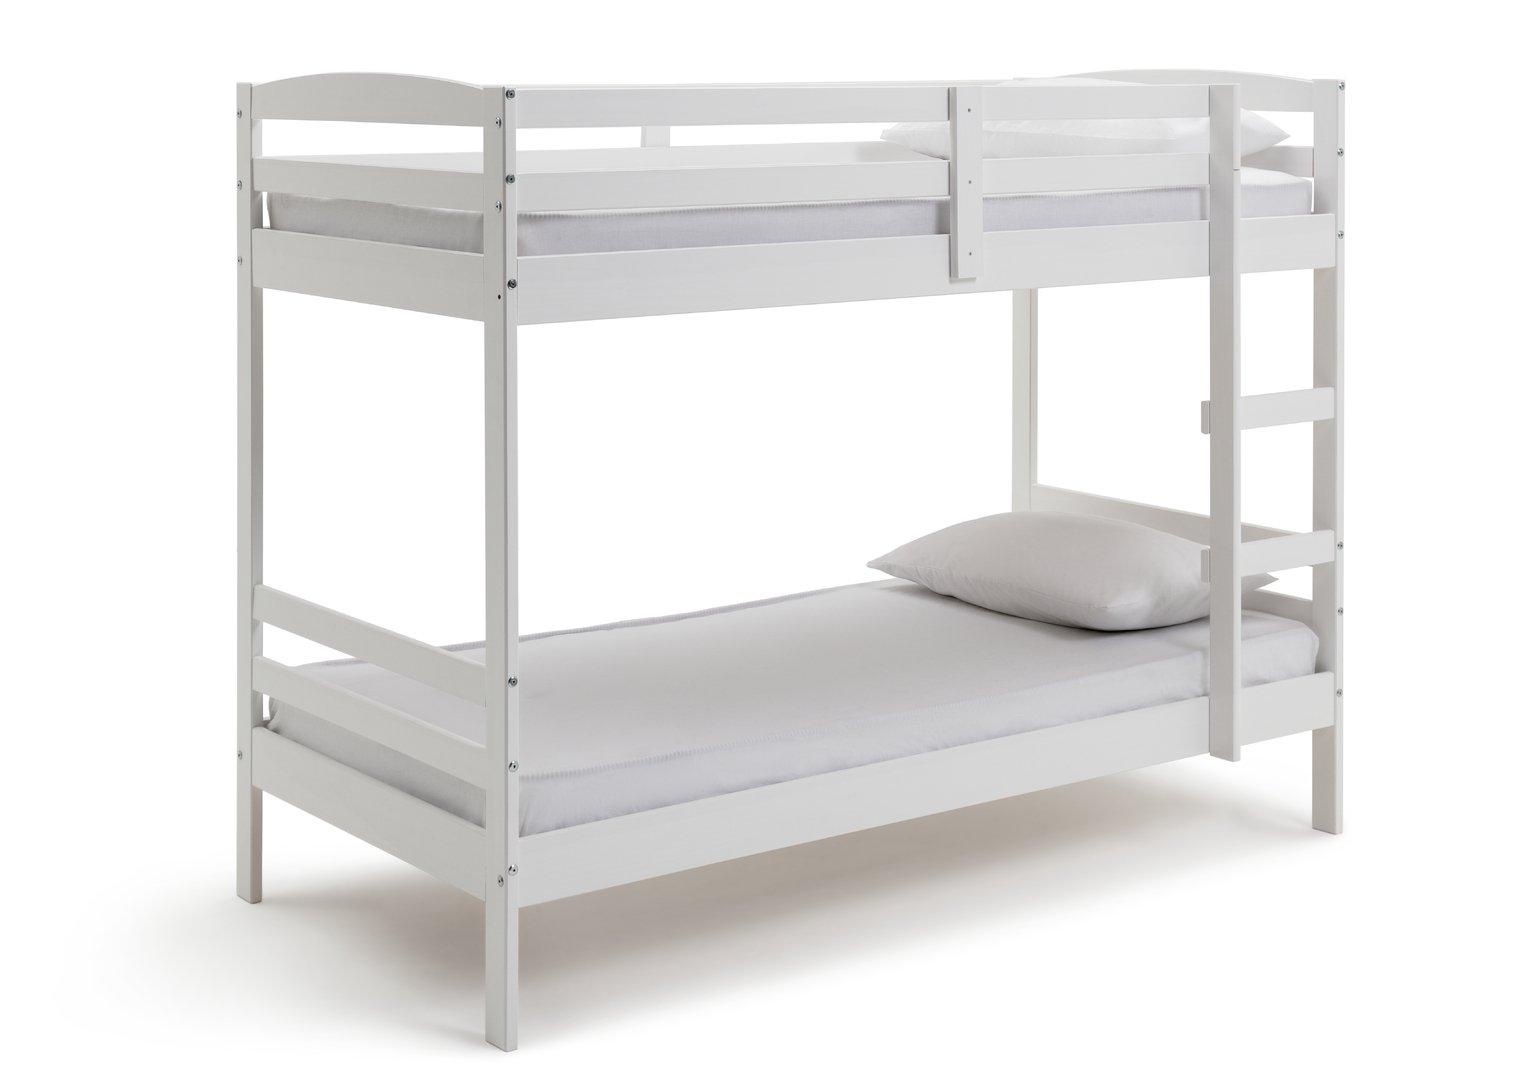 Buy Argos Home Josie Shorty Bunk Bed With 2 Mattresses White